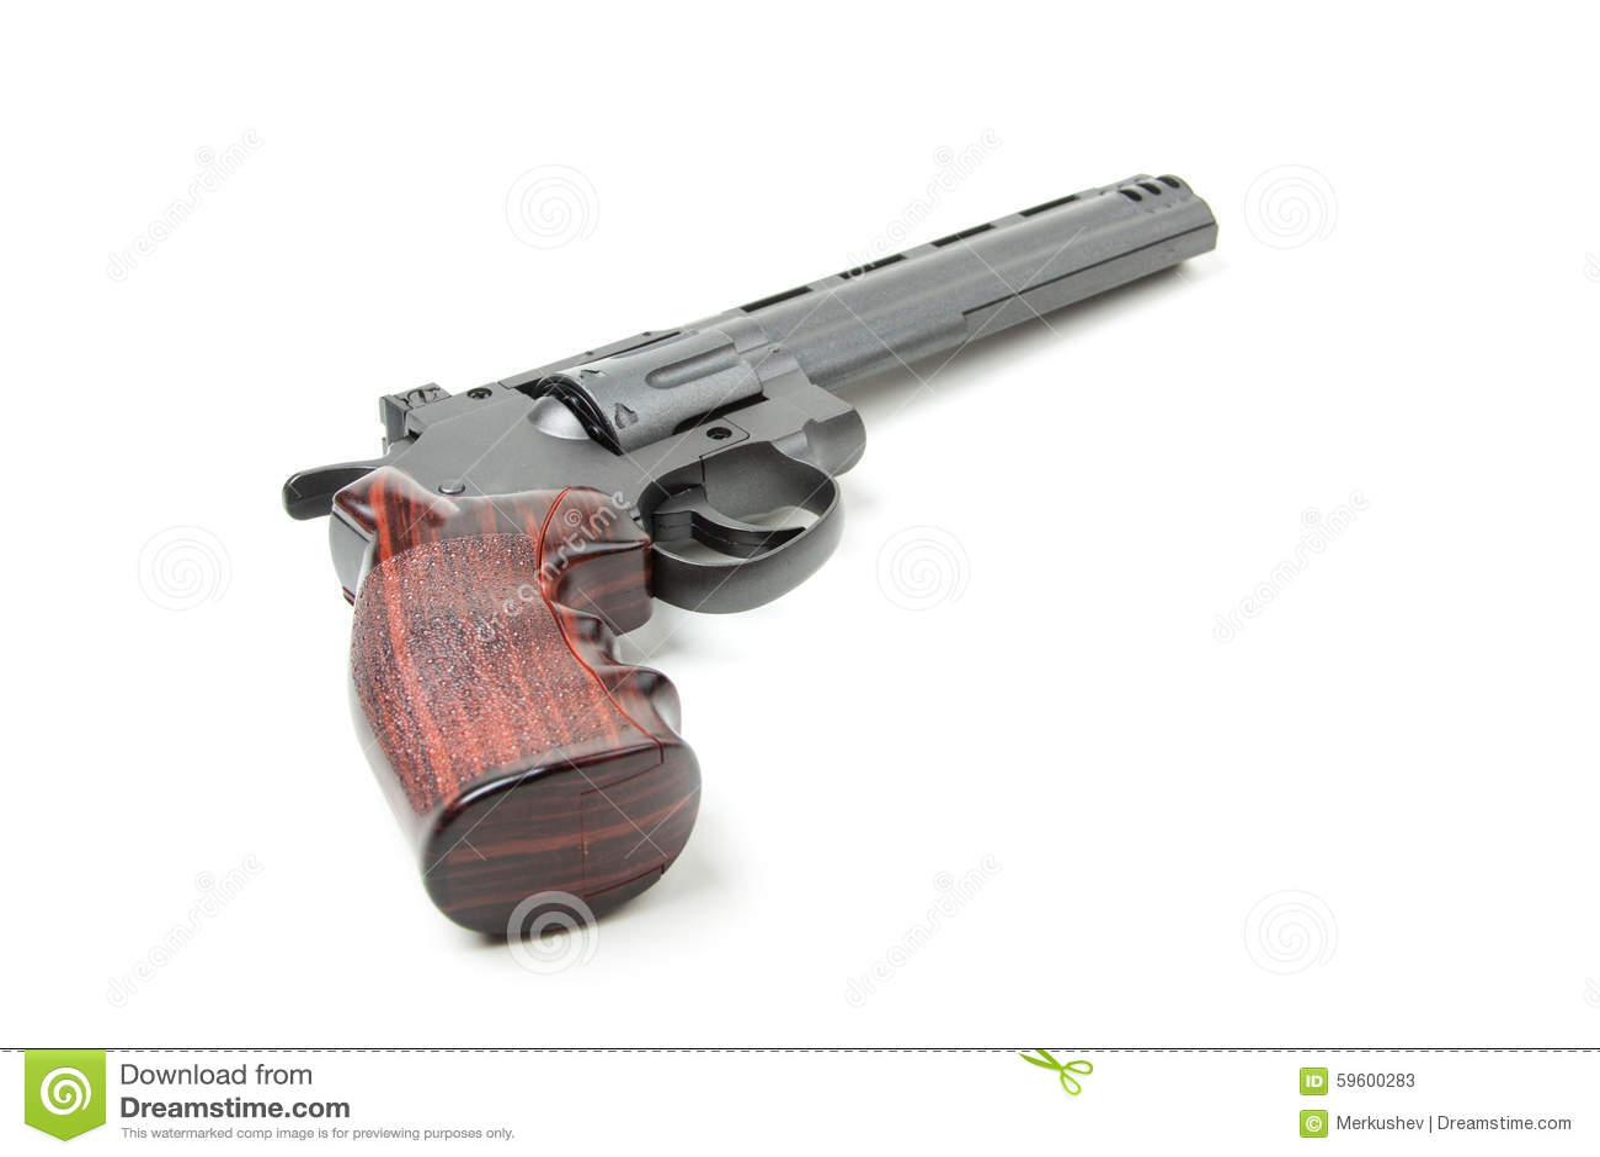 gun white background - photo #38